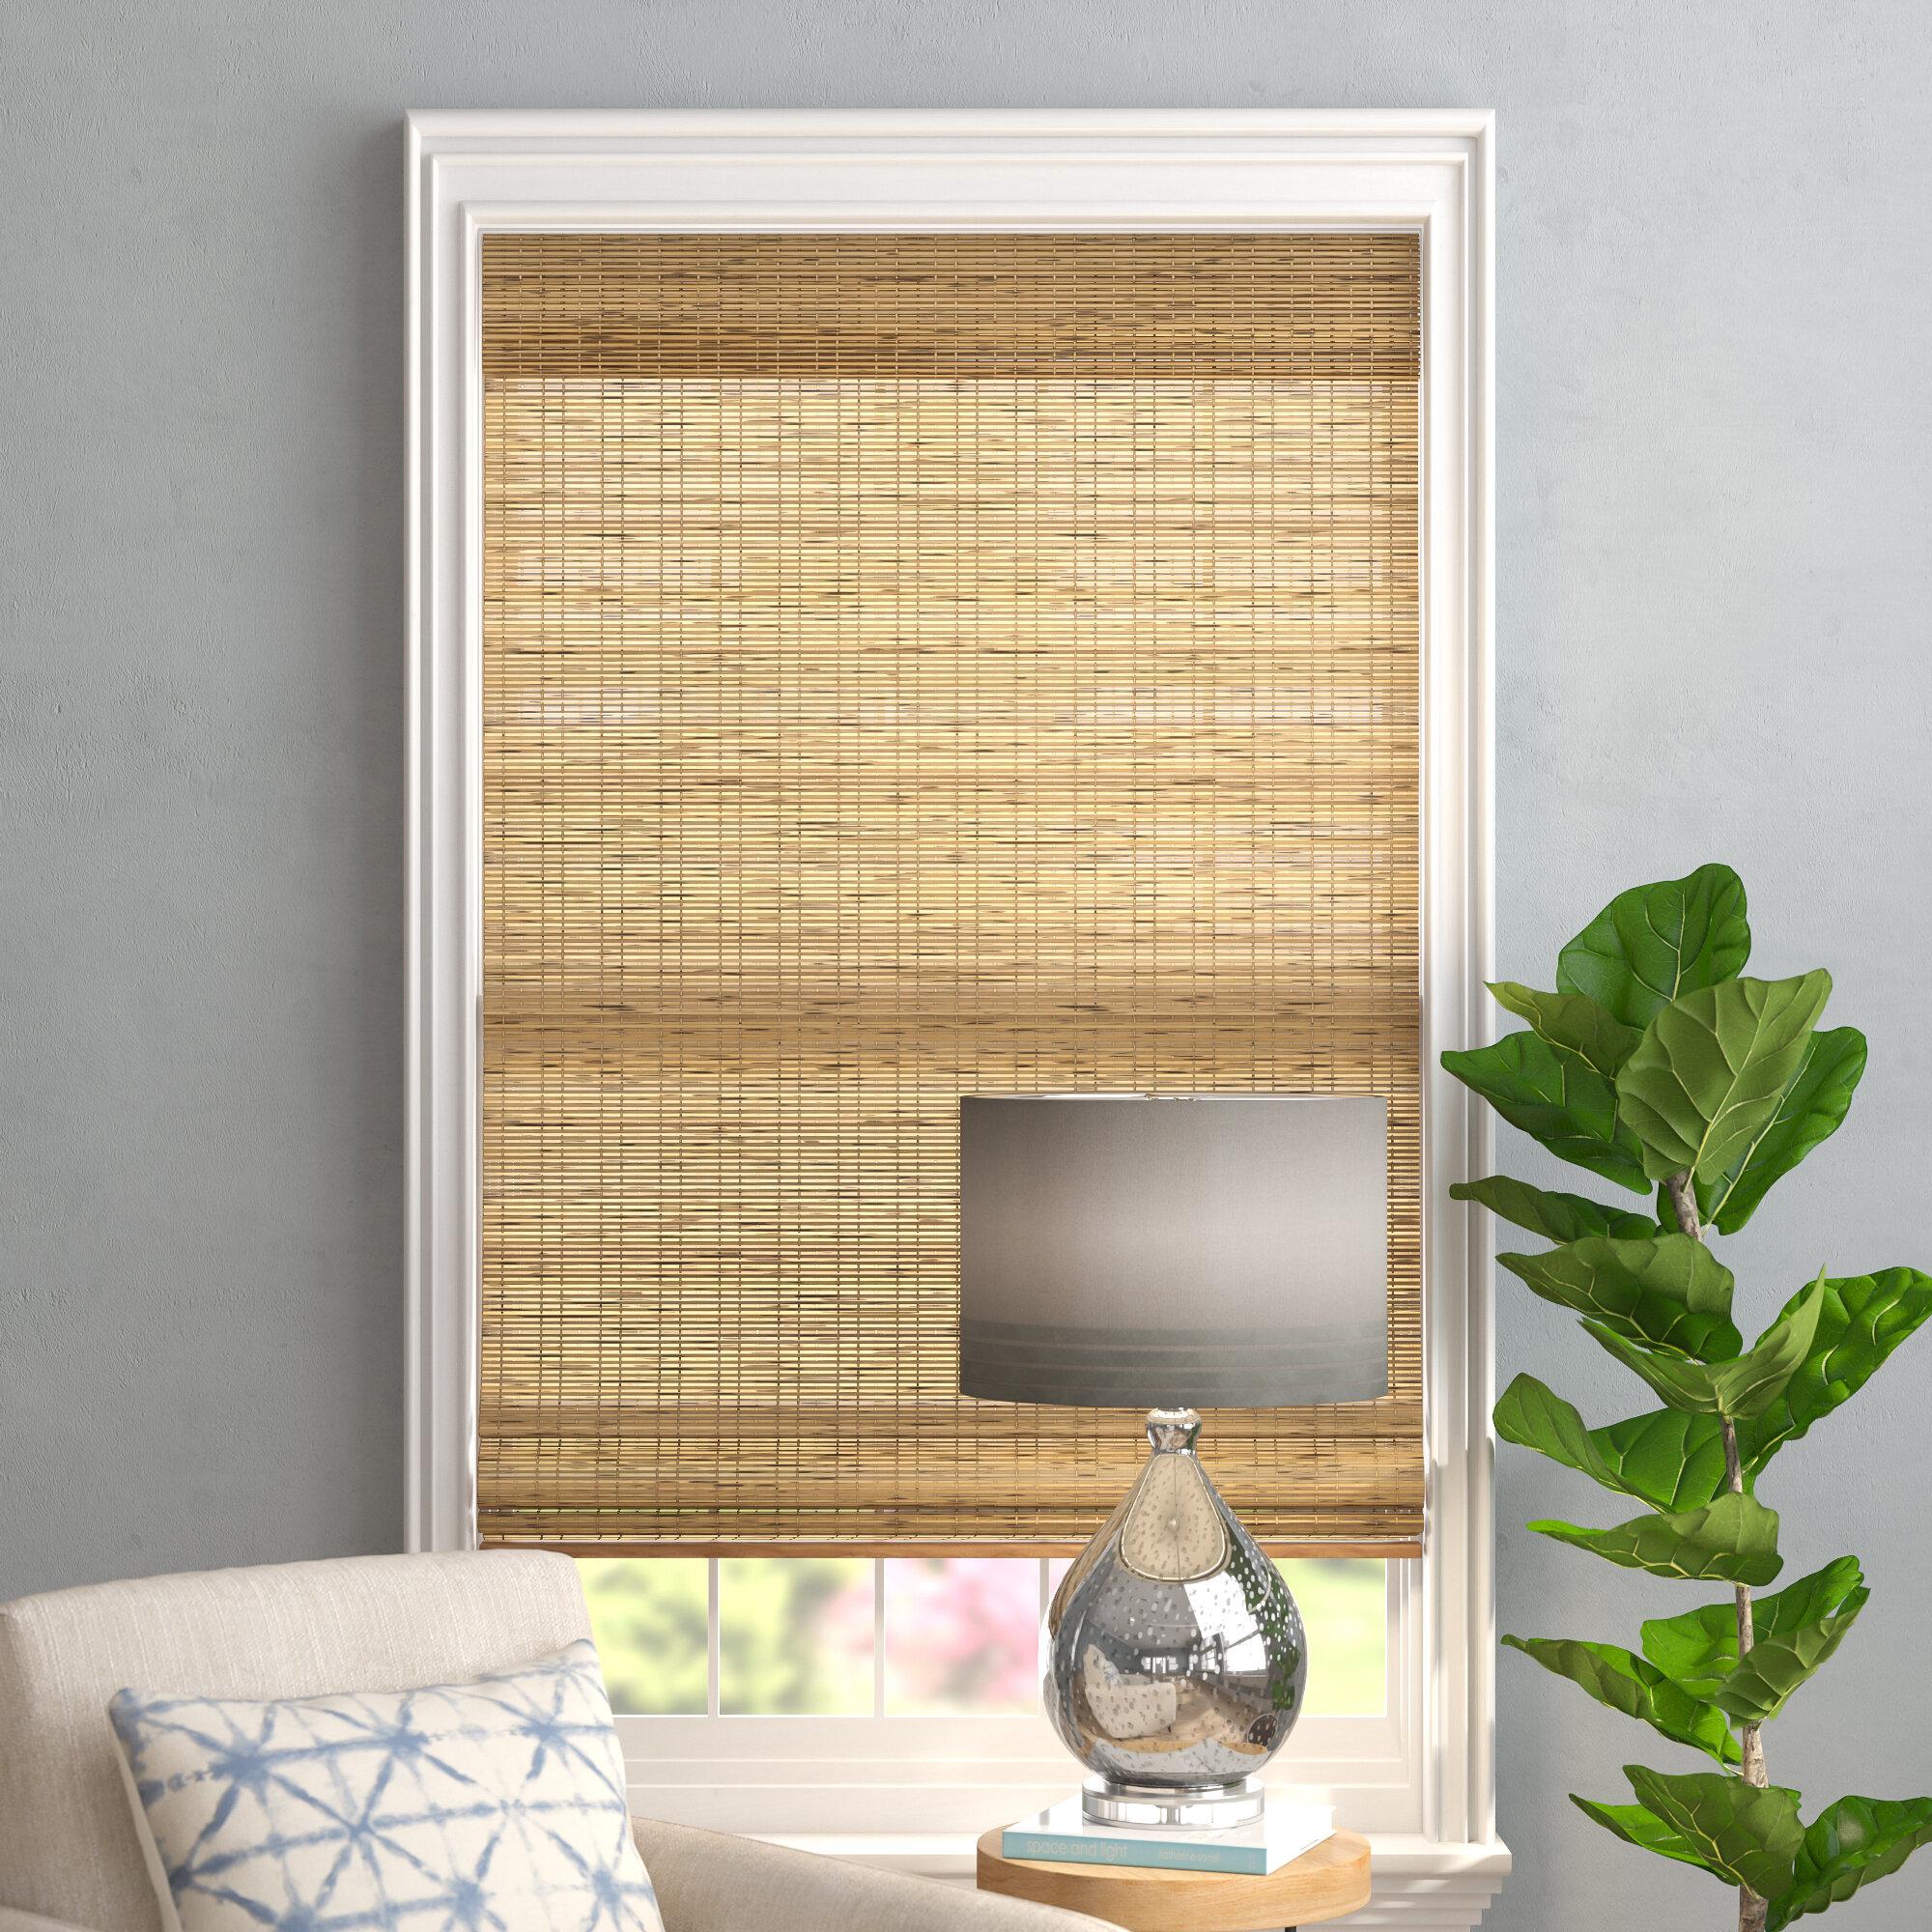 Bamboo Blinds Shades You Ll Love In 2021 Wayfair